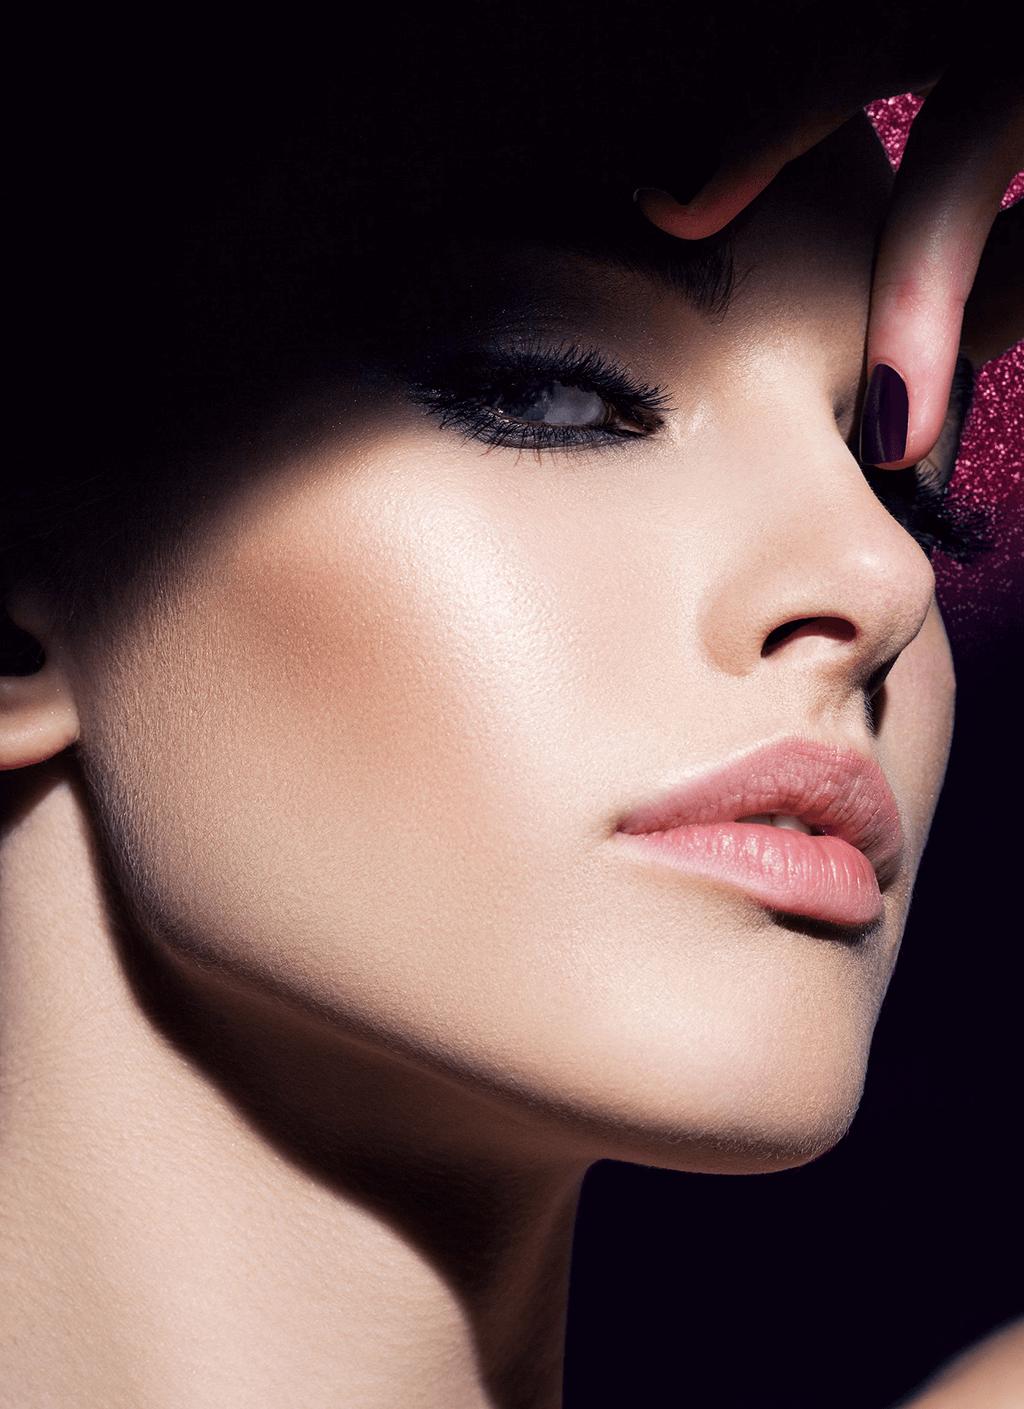 Medicina estética Facial Aumento de pómulos